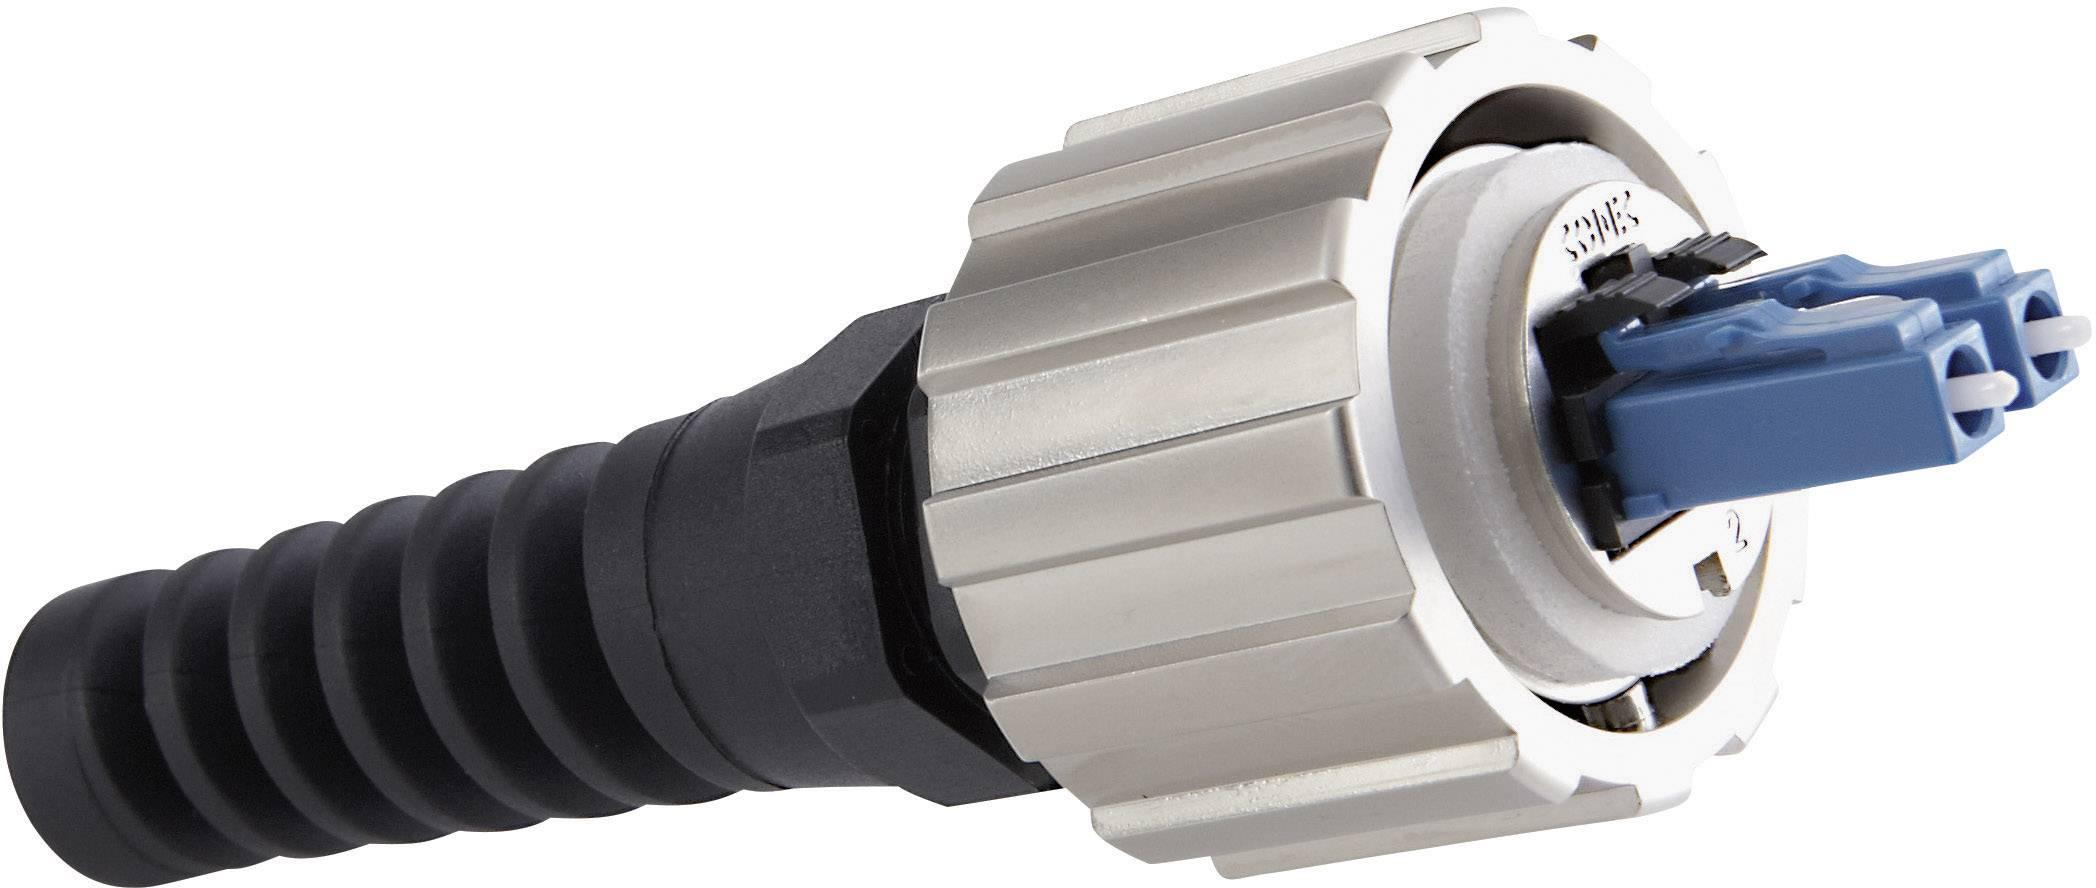 Konektor optických vláken IP67 Conec, 17-300030